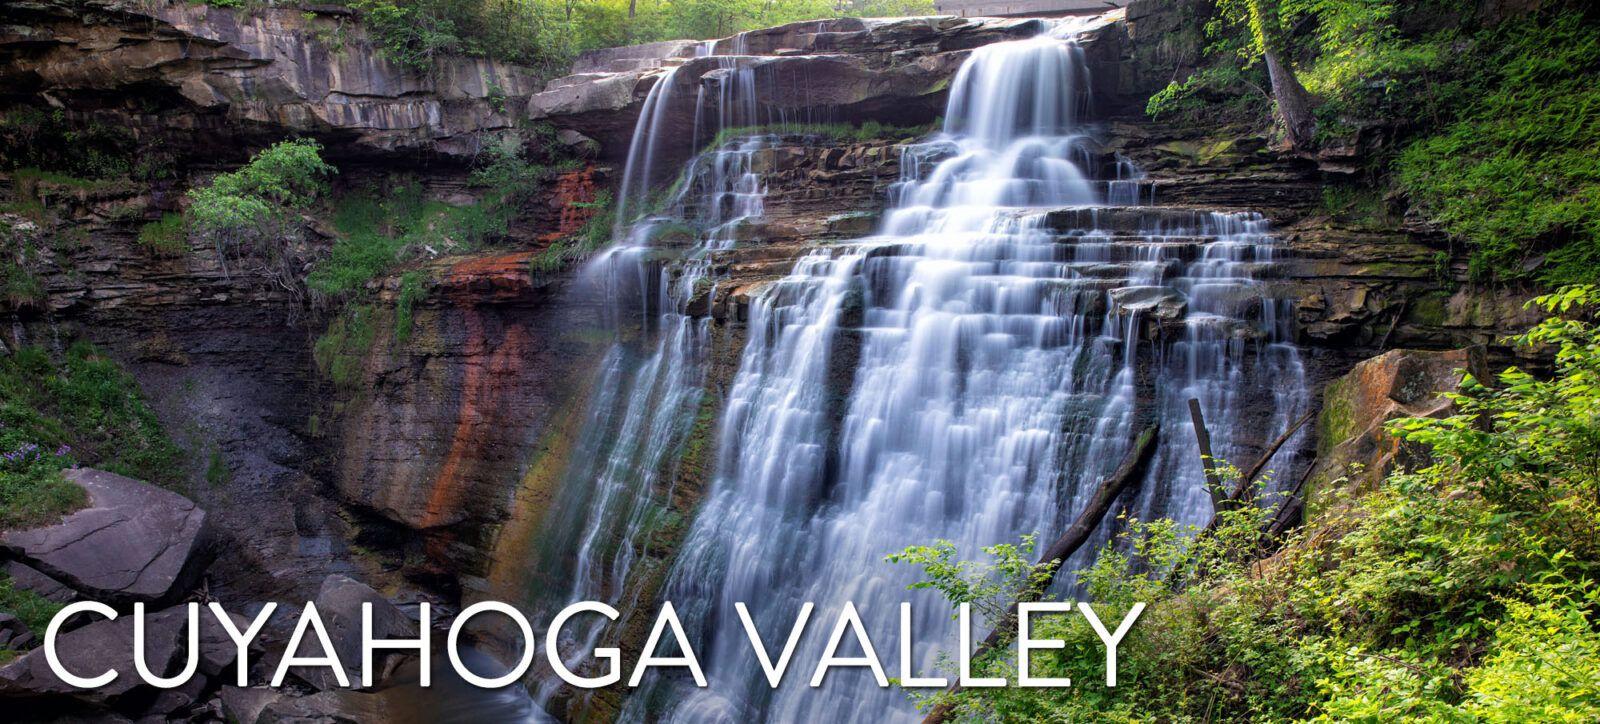 Cuyahoga Valley